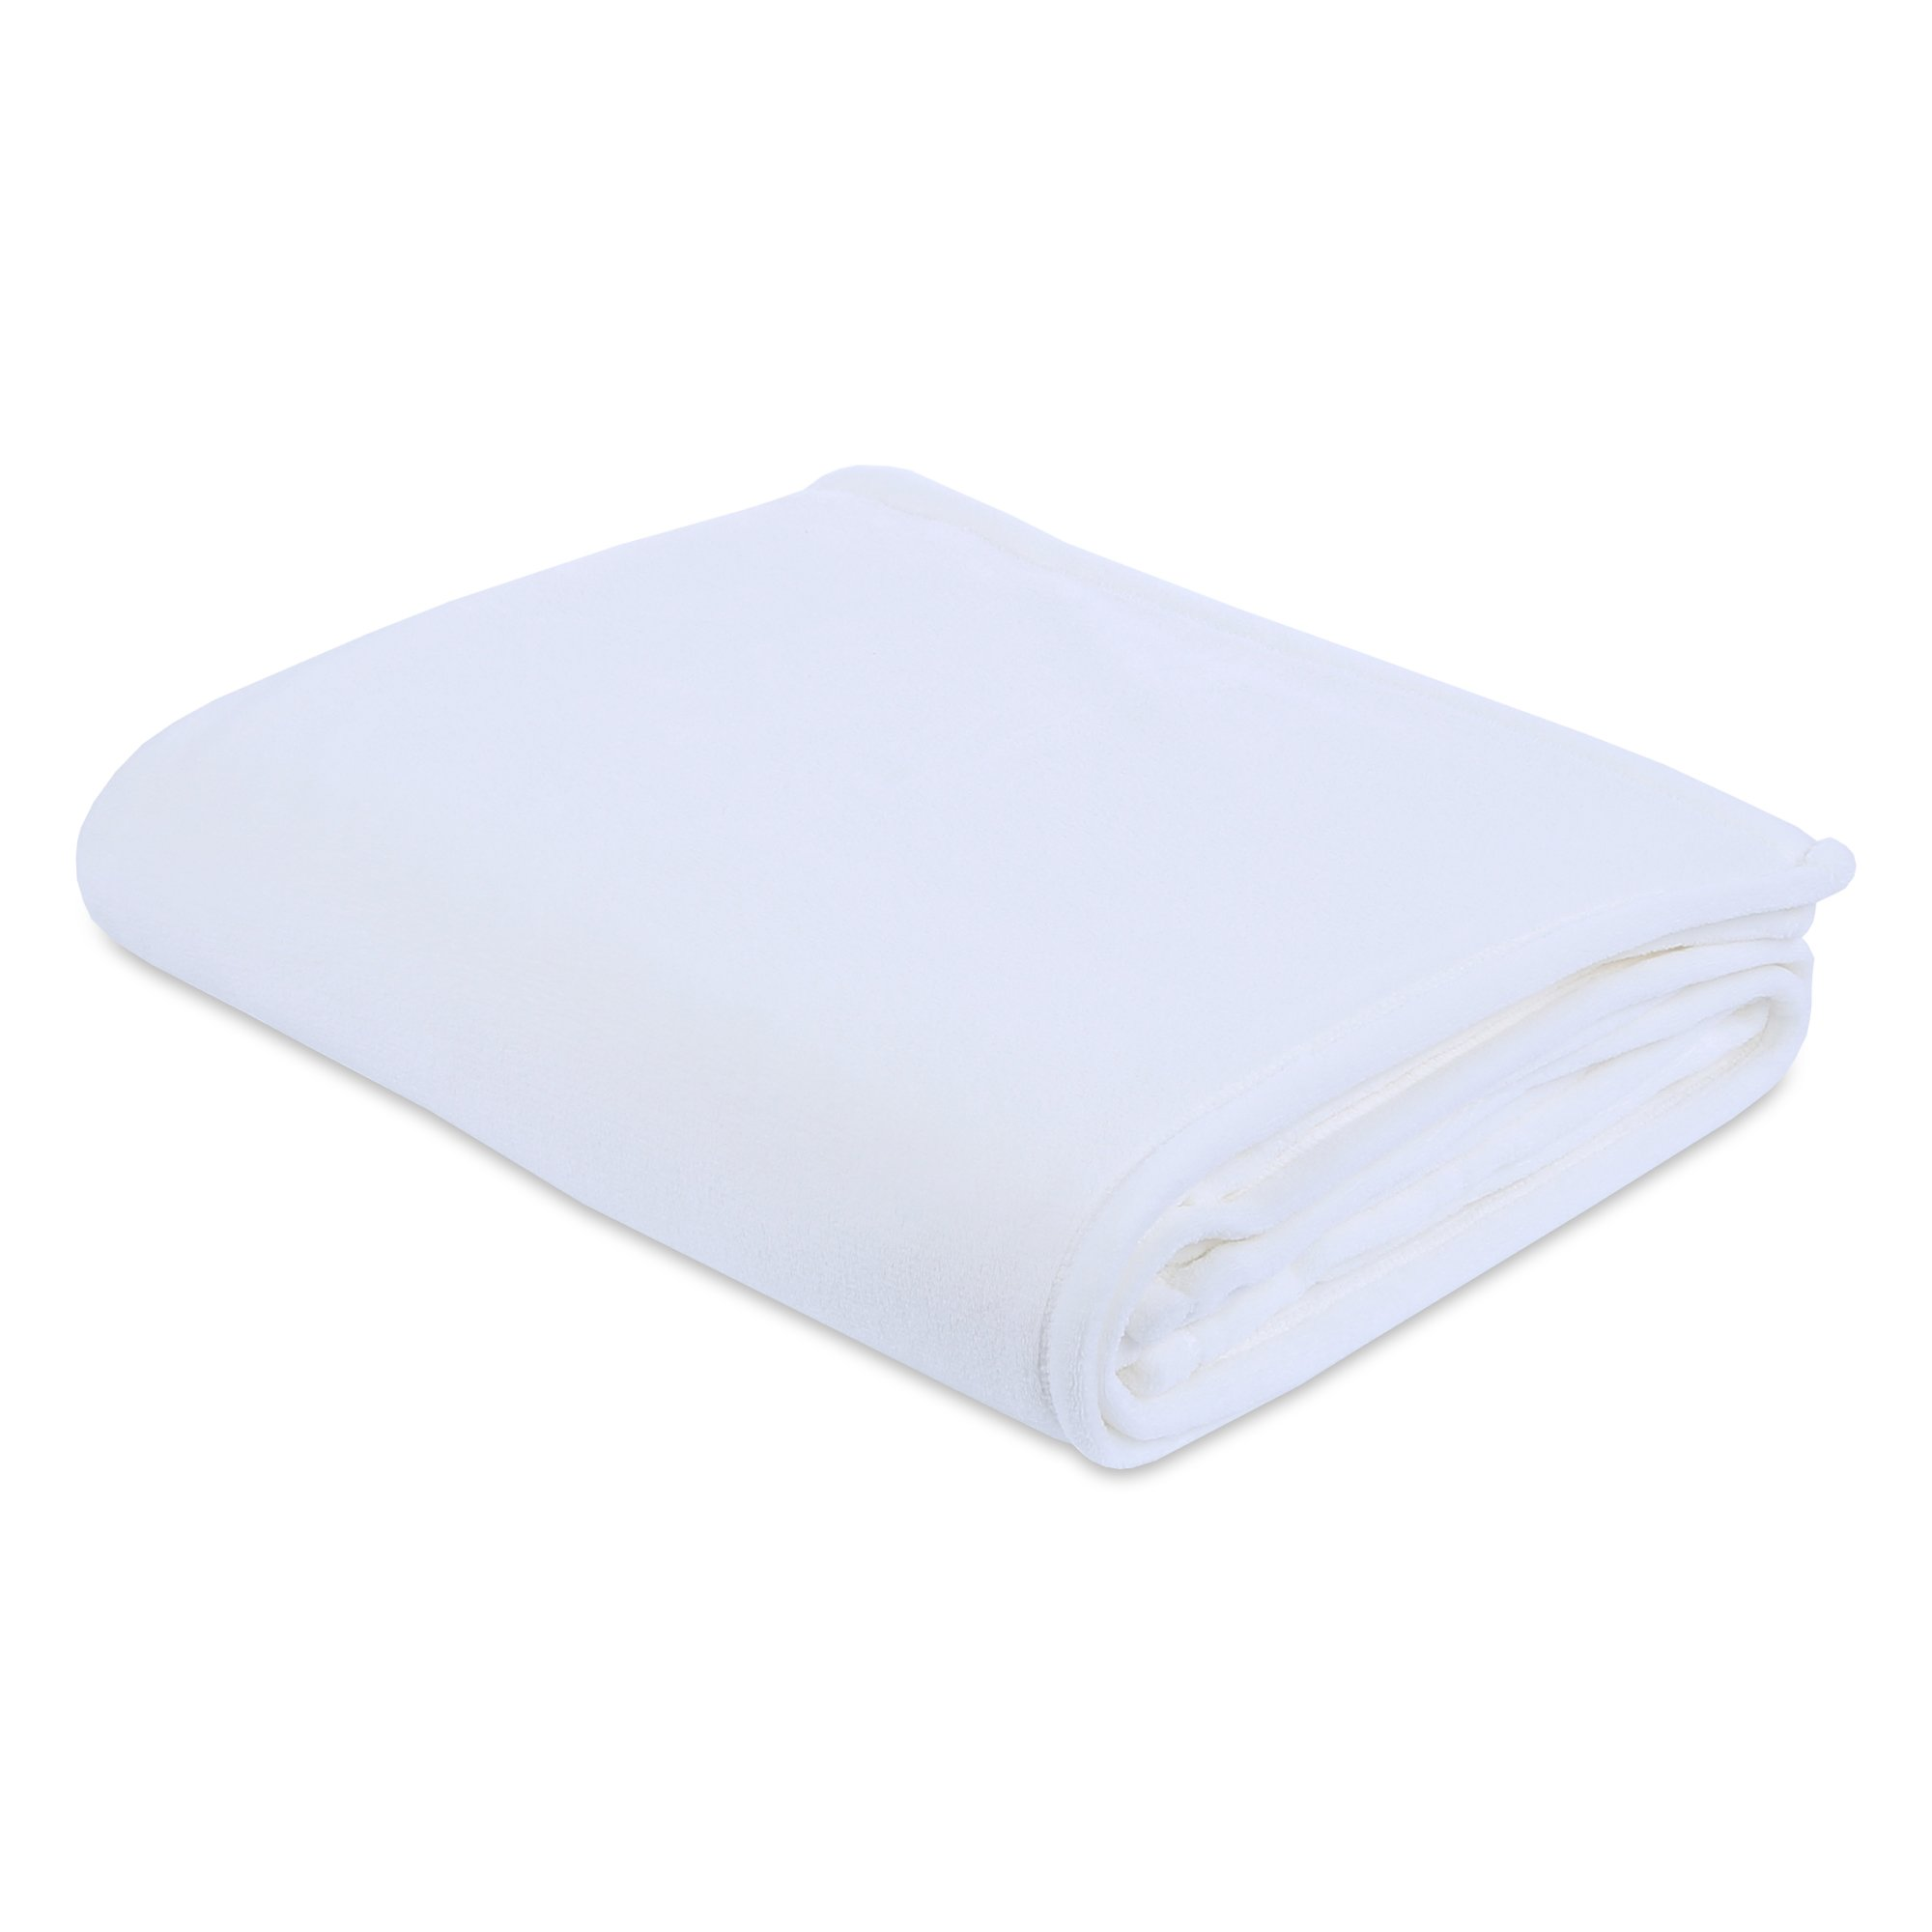 Berkshire Blanket Plush Serasoft Bed Blanket with Polartec Warmth Technology, Full/Queen, White